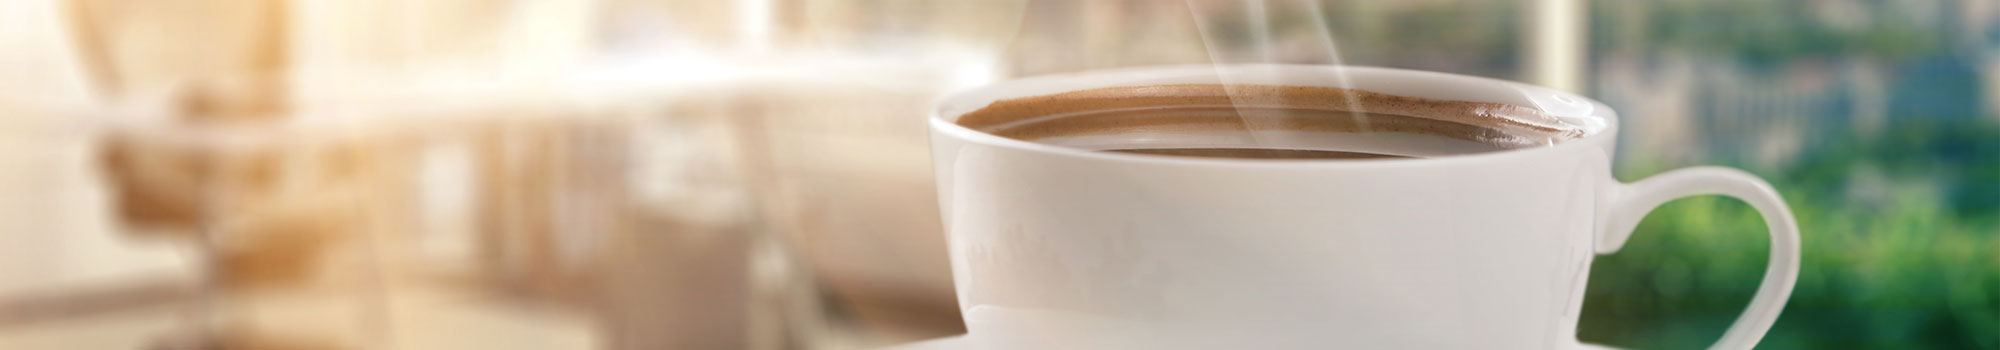 header_kaffeeautomatenoffice